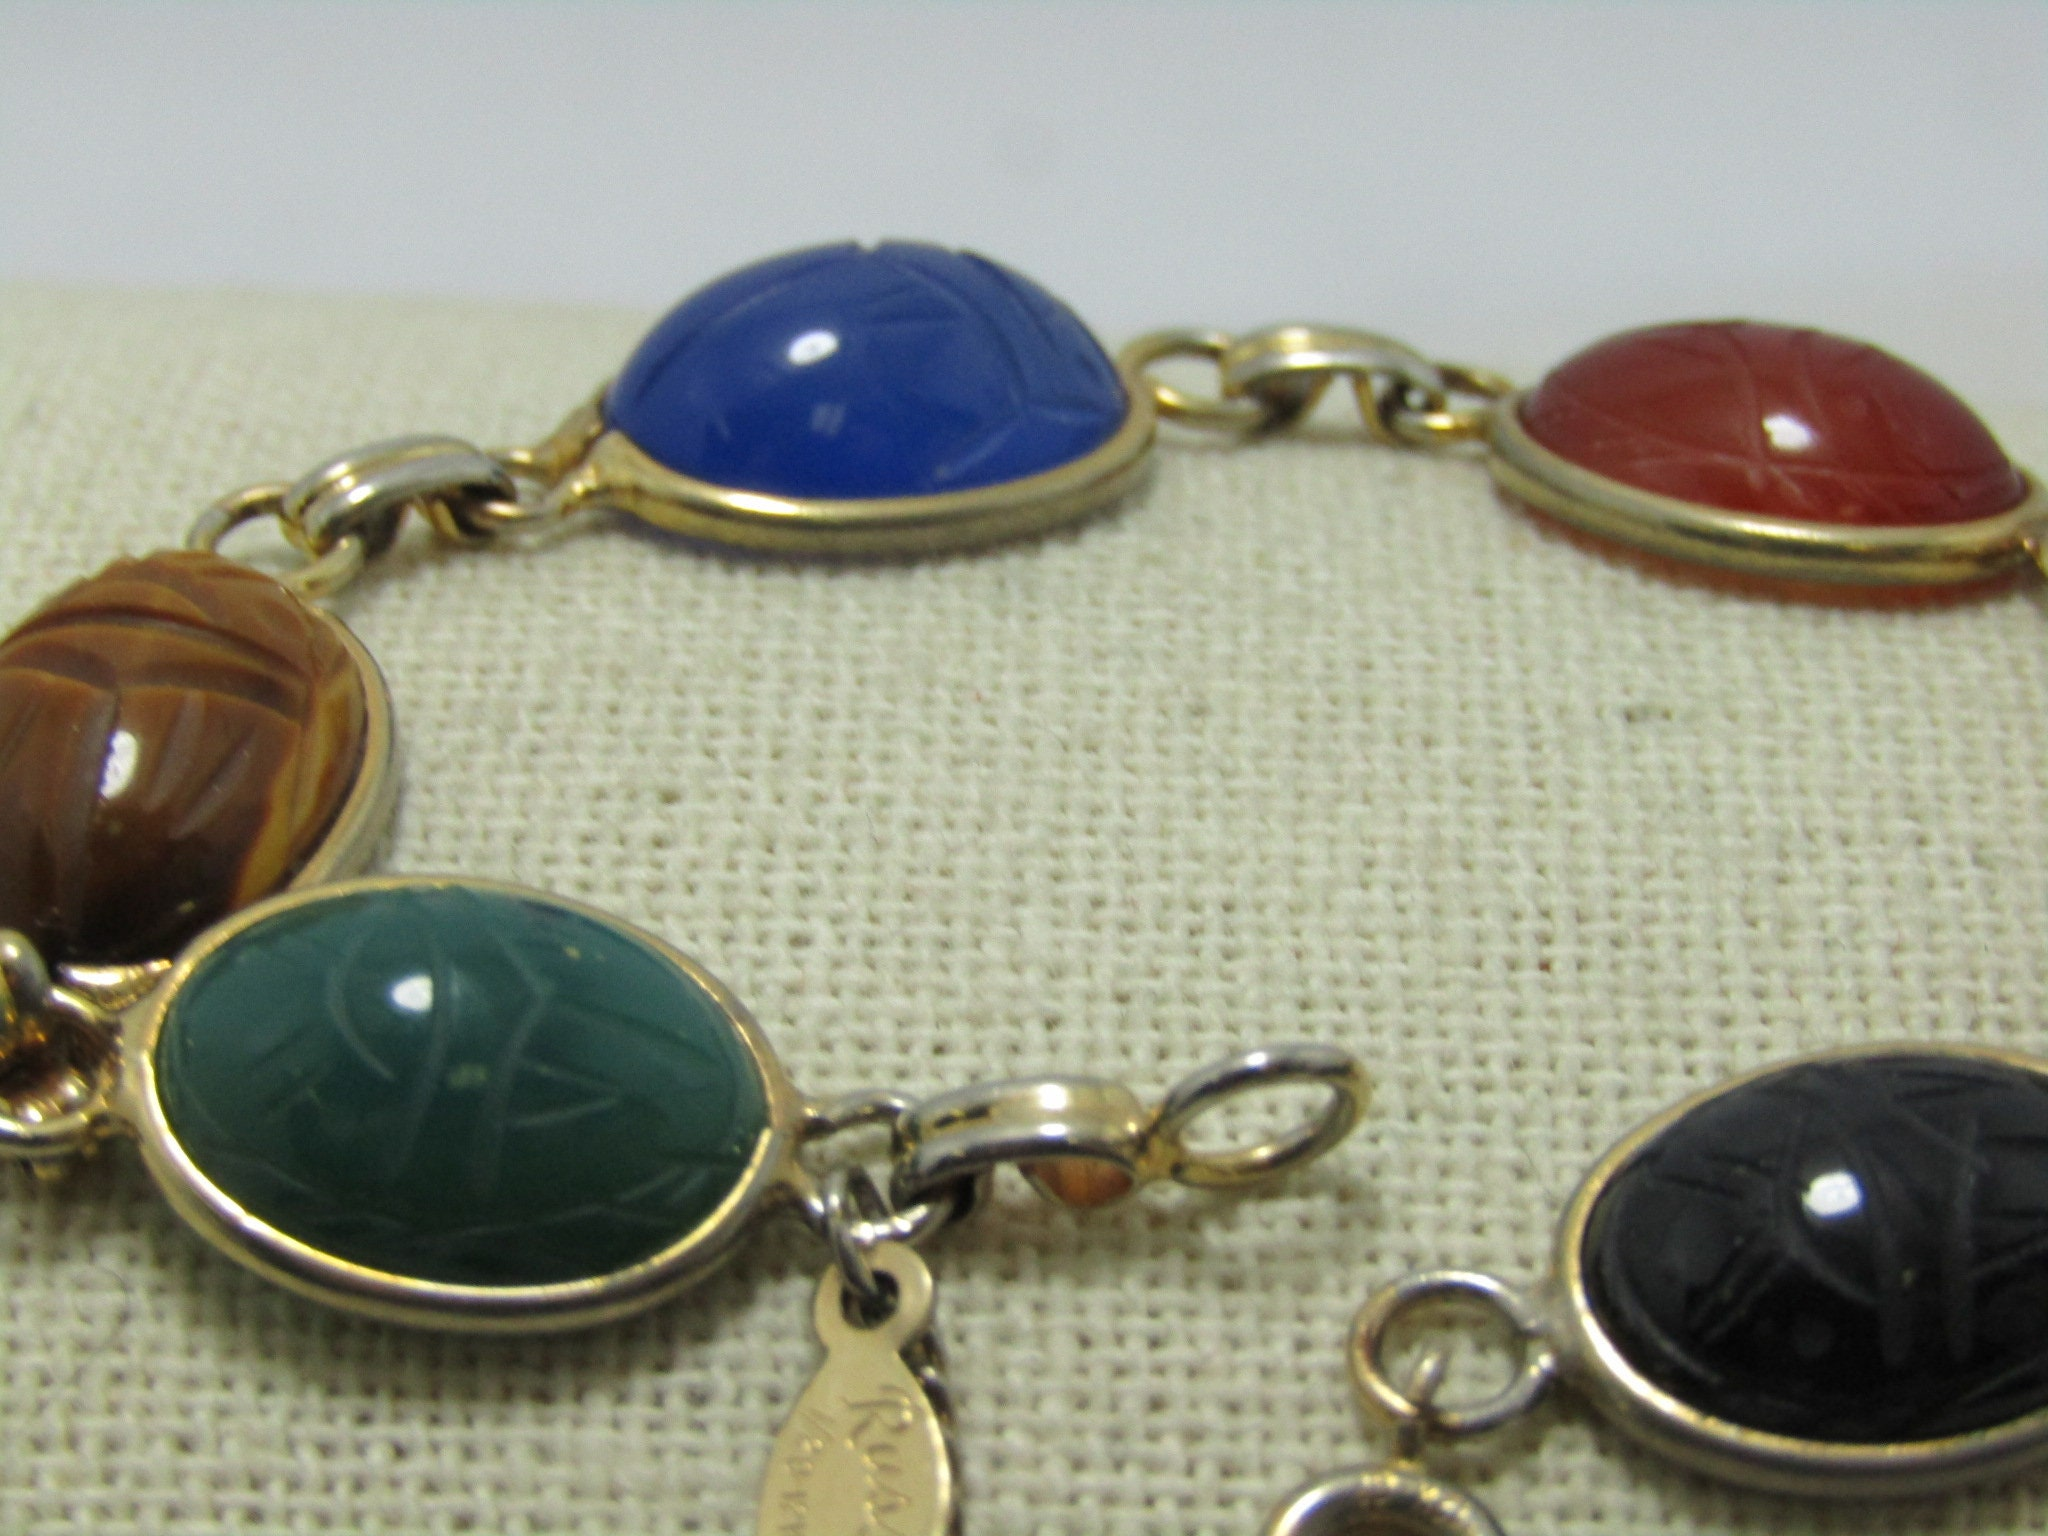 Vintage 12kt. G.F. Scarab Bracelet, signed Russel, Unakite, tiger's eye,  onyx, chrysoprase, carnelian, Safety Chain, 7.5